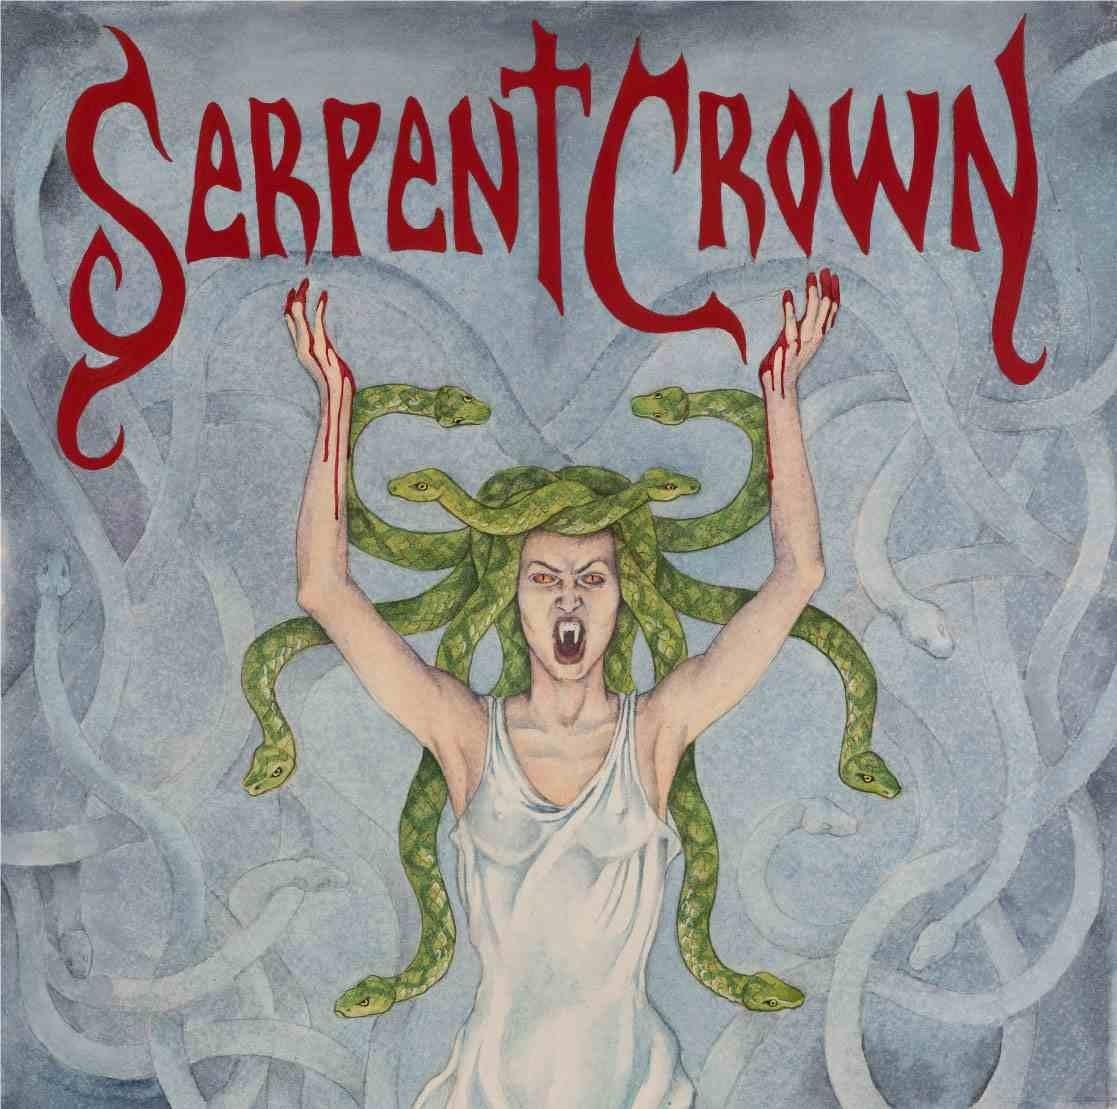 Serpent Crown – Serpent Crown